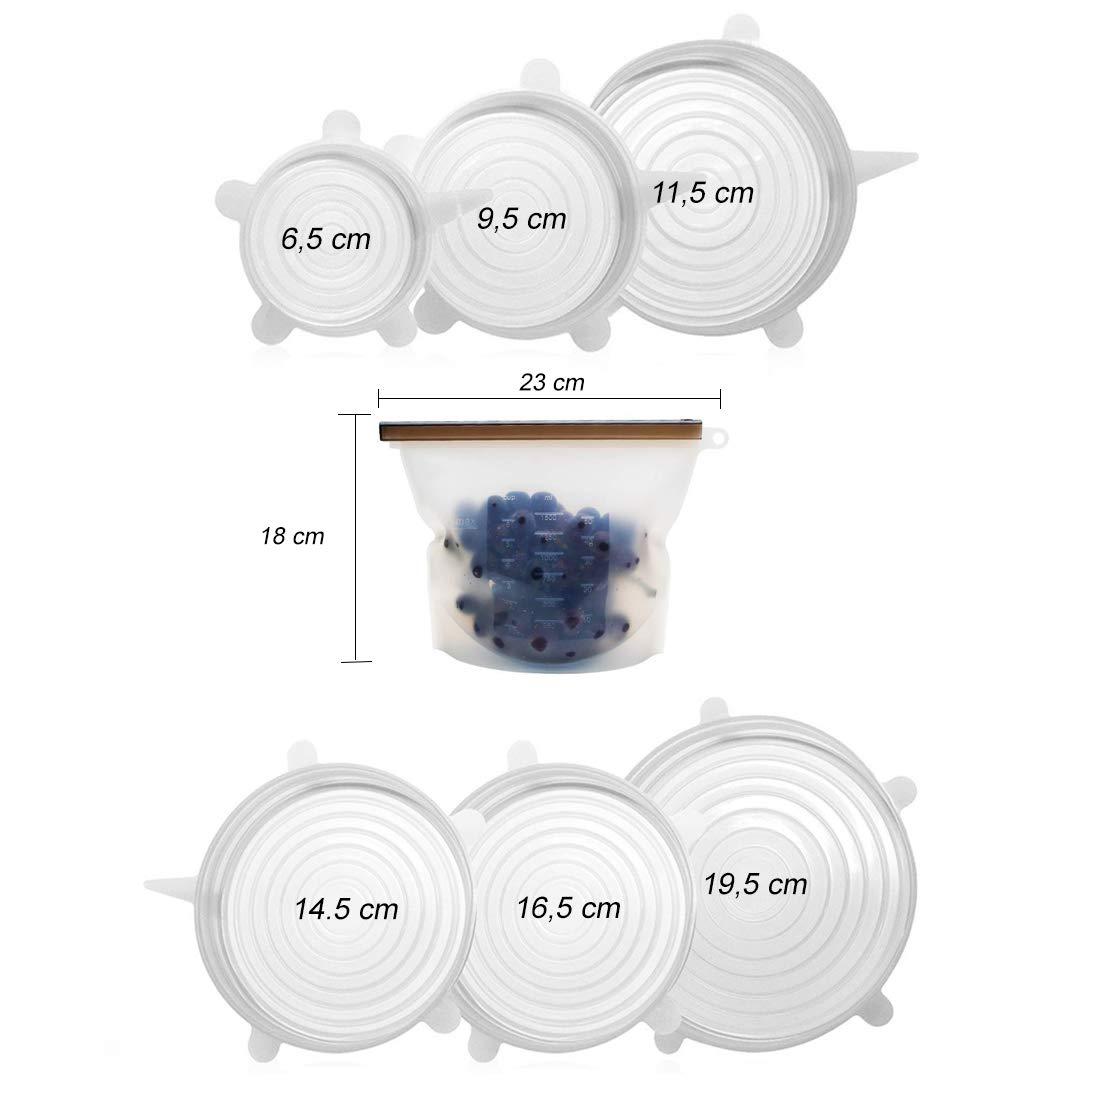 Fundas para Tazones Blanco Cubierta De Mantenimiento Fresco Azul Shurit Tapas Silicona Ajustables Cocina Universal El/ásticas 6 Set Extensible Reutilizable Herm/ético para Horno Microondas